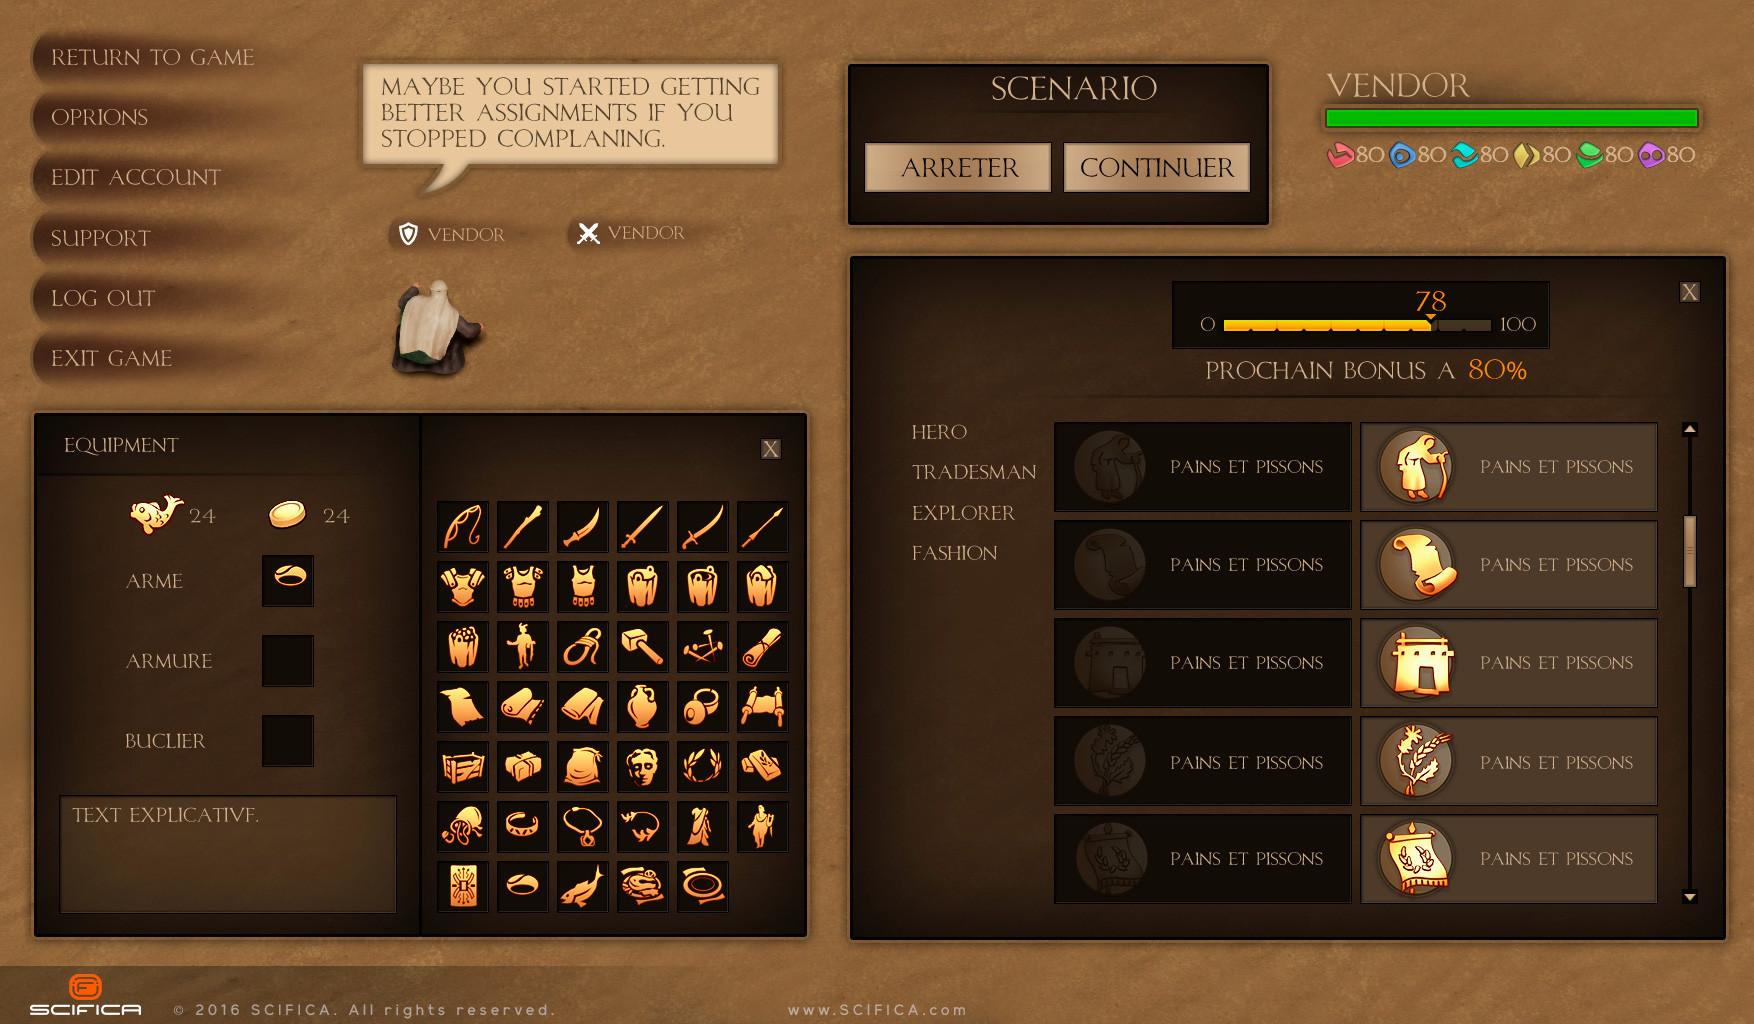 ArtStation - Video Game UI Design for PC adventure game